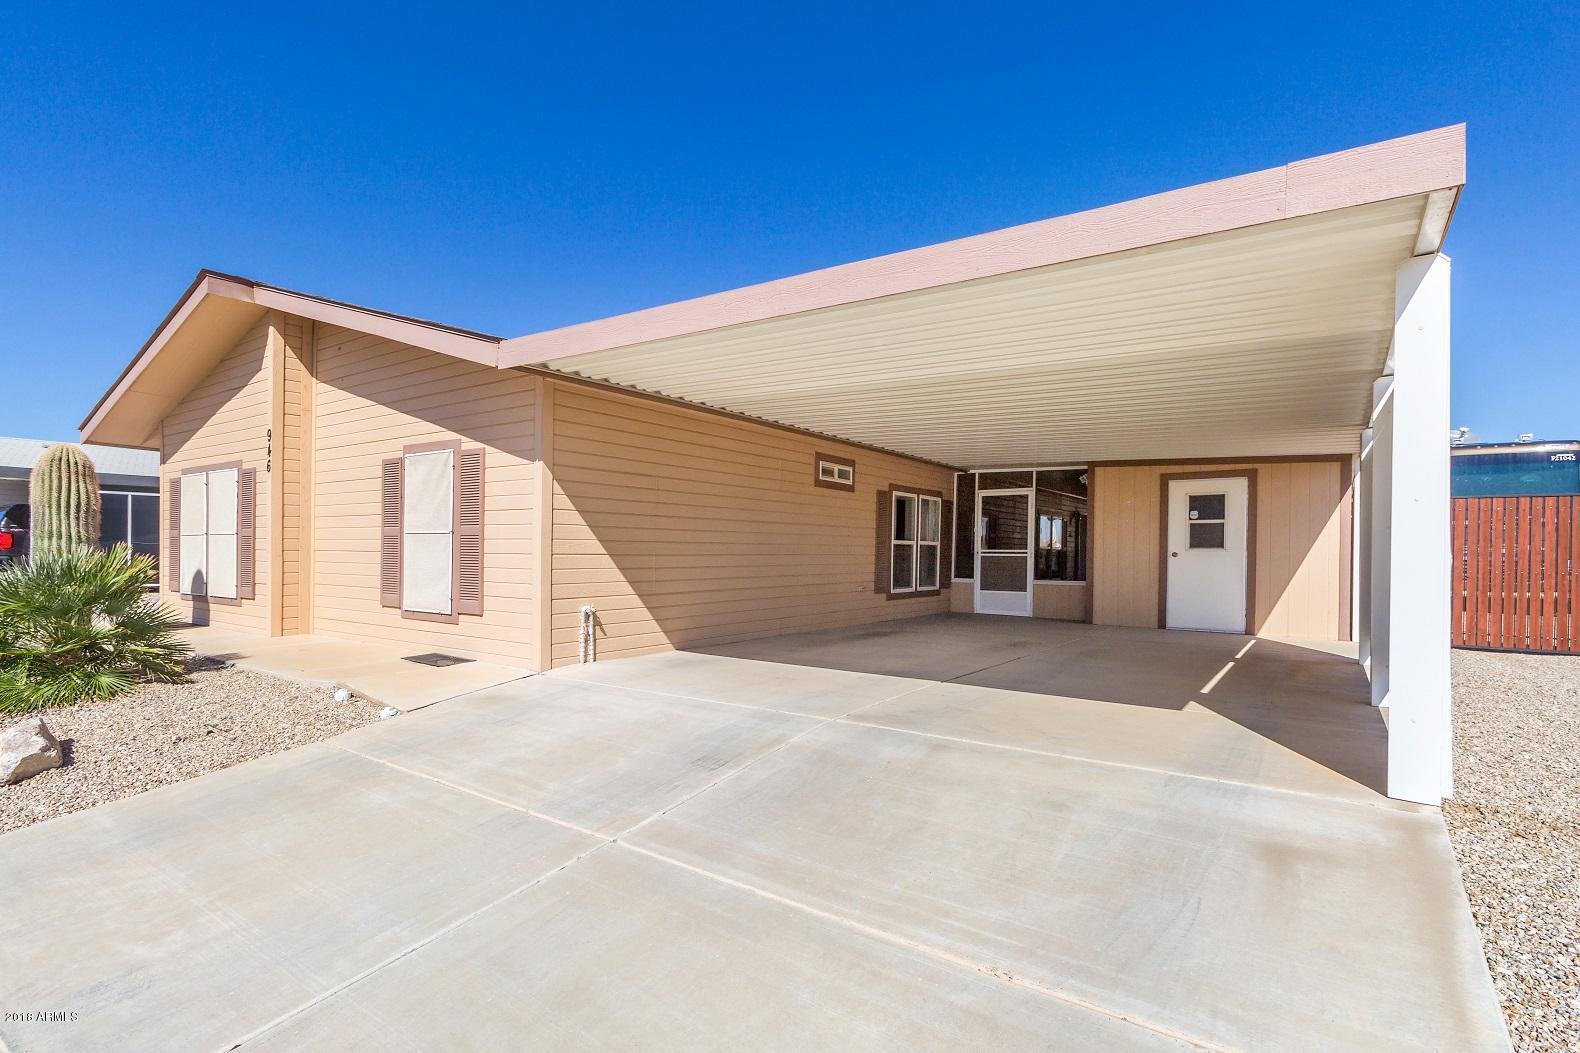 Photo for 946 W Diamond Rim Drive, Casa Grande, AZ 85122 (MLS # 5816522)